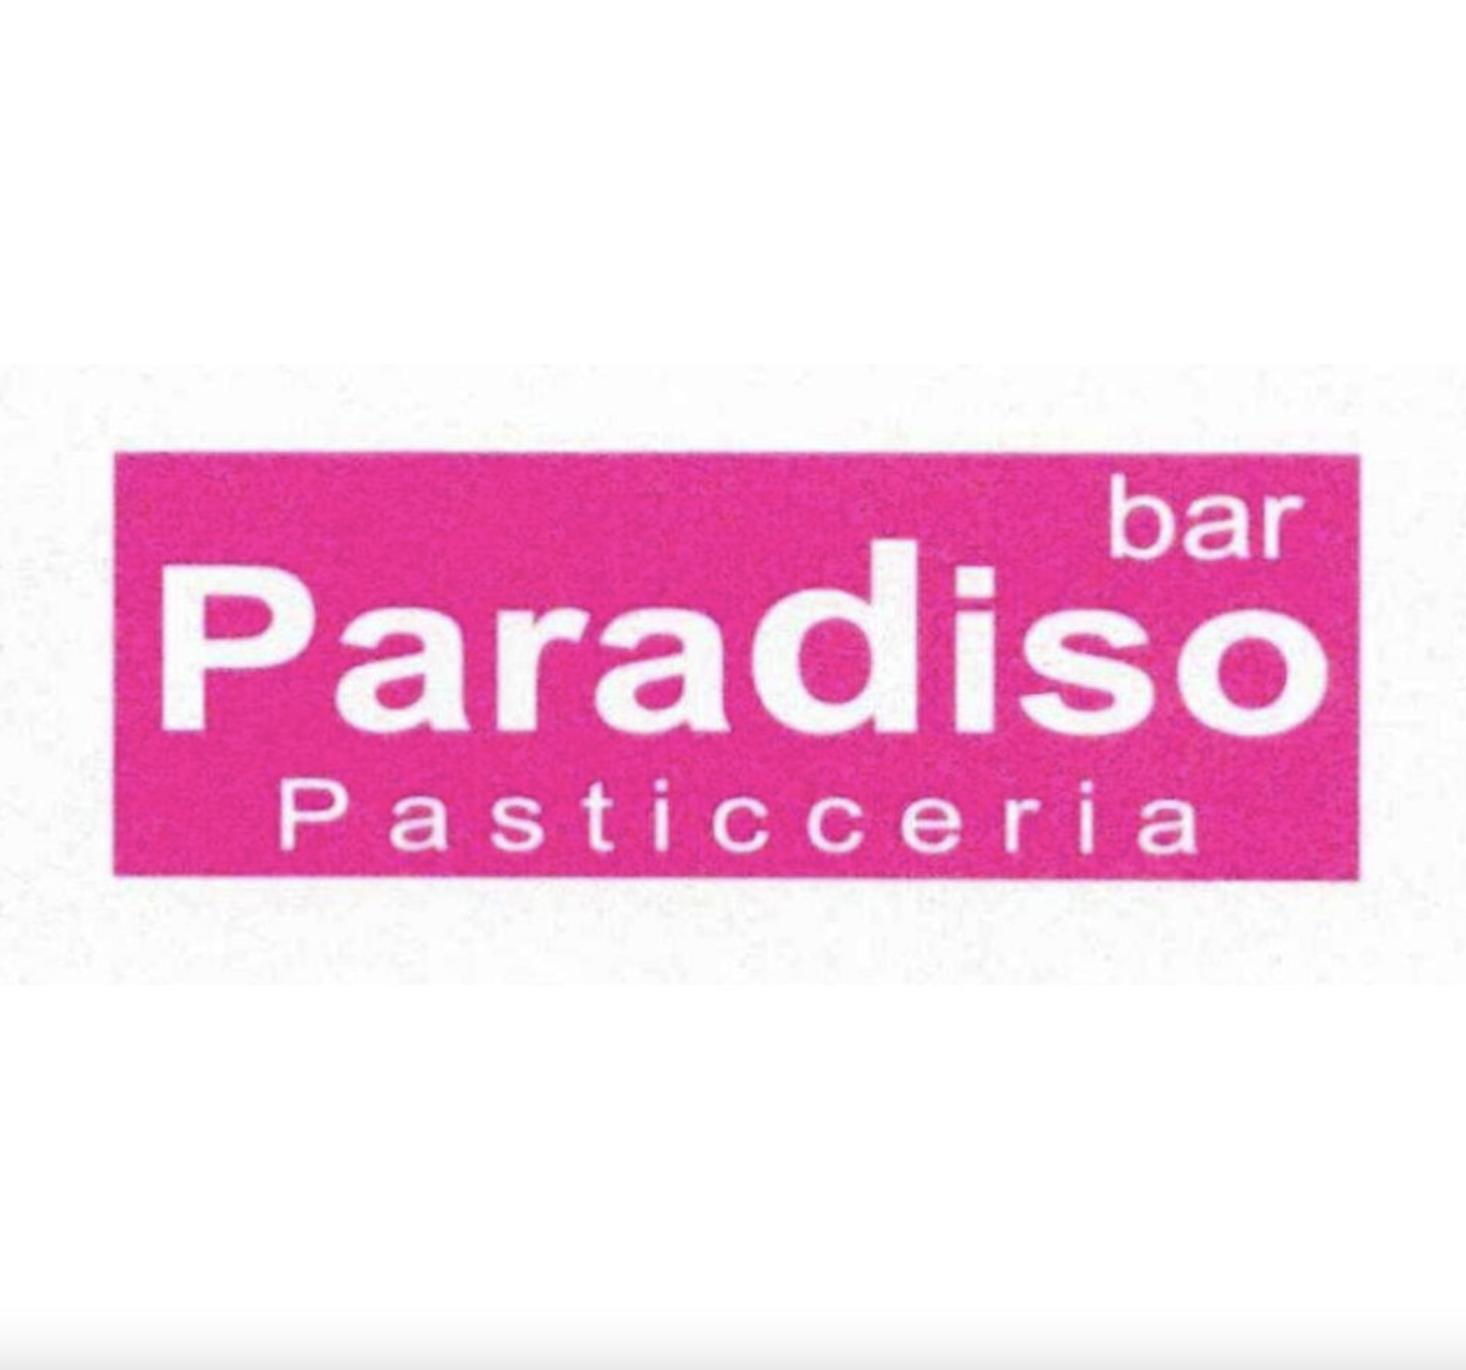 bar pasticceria Paradiso